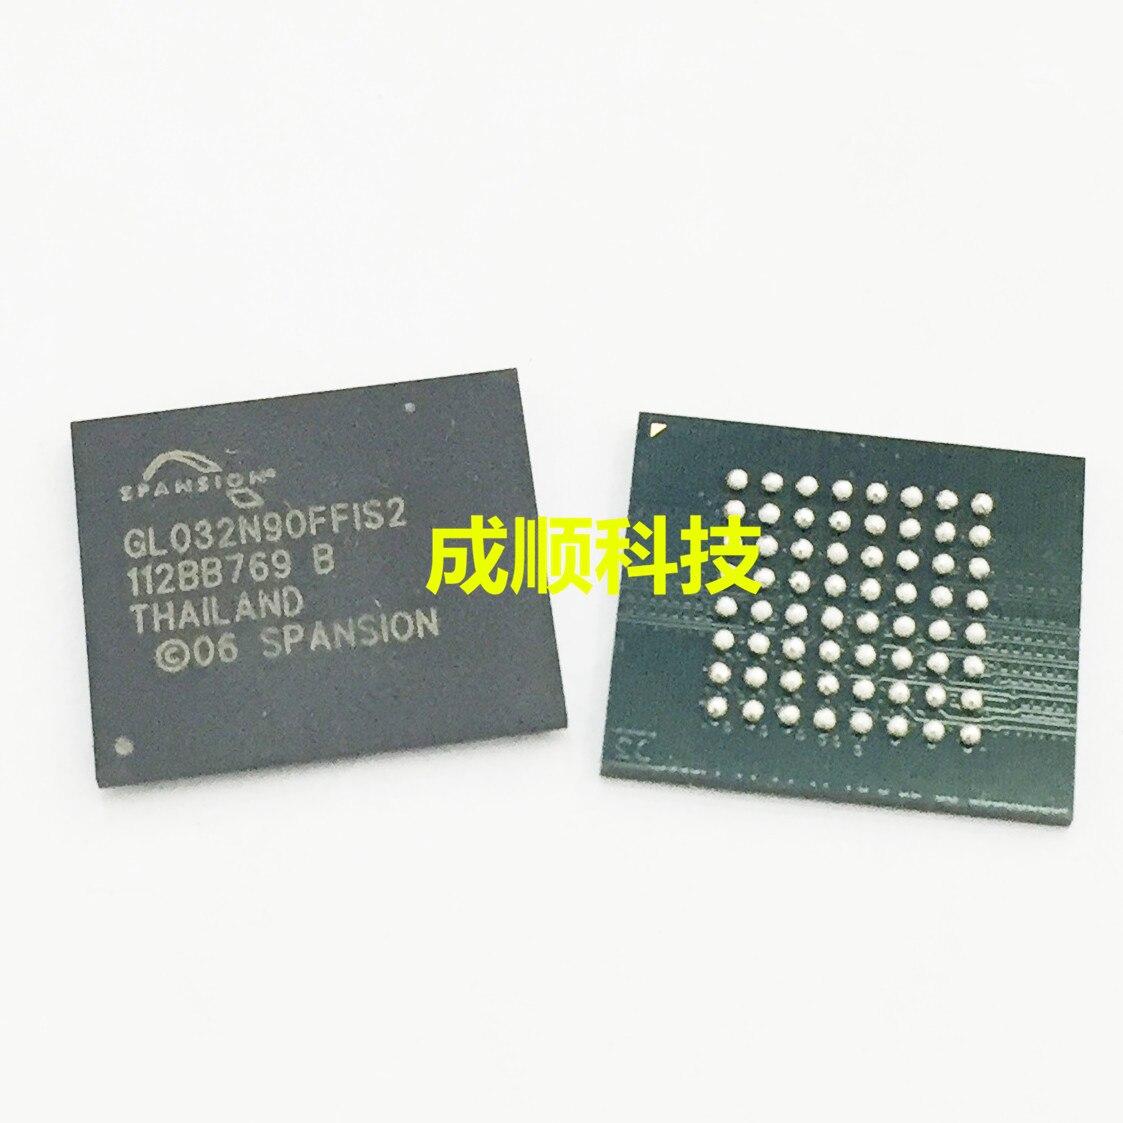 5 unids/lote S29GL032N90FFIS20 S29GL032N90FFIS2 S29GL032N90 BGA coche cpu chips